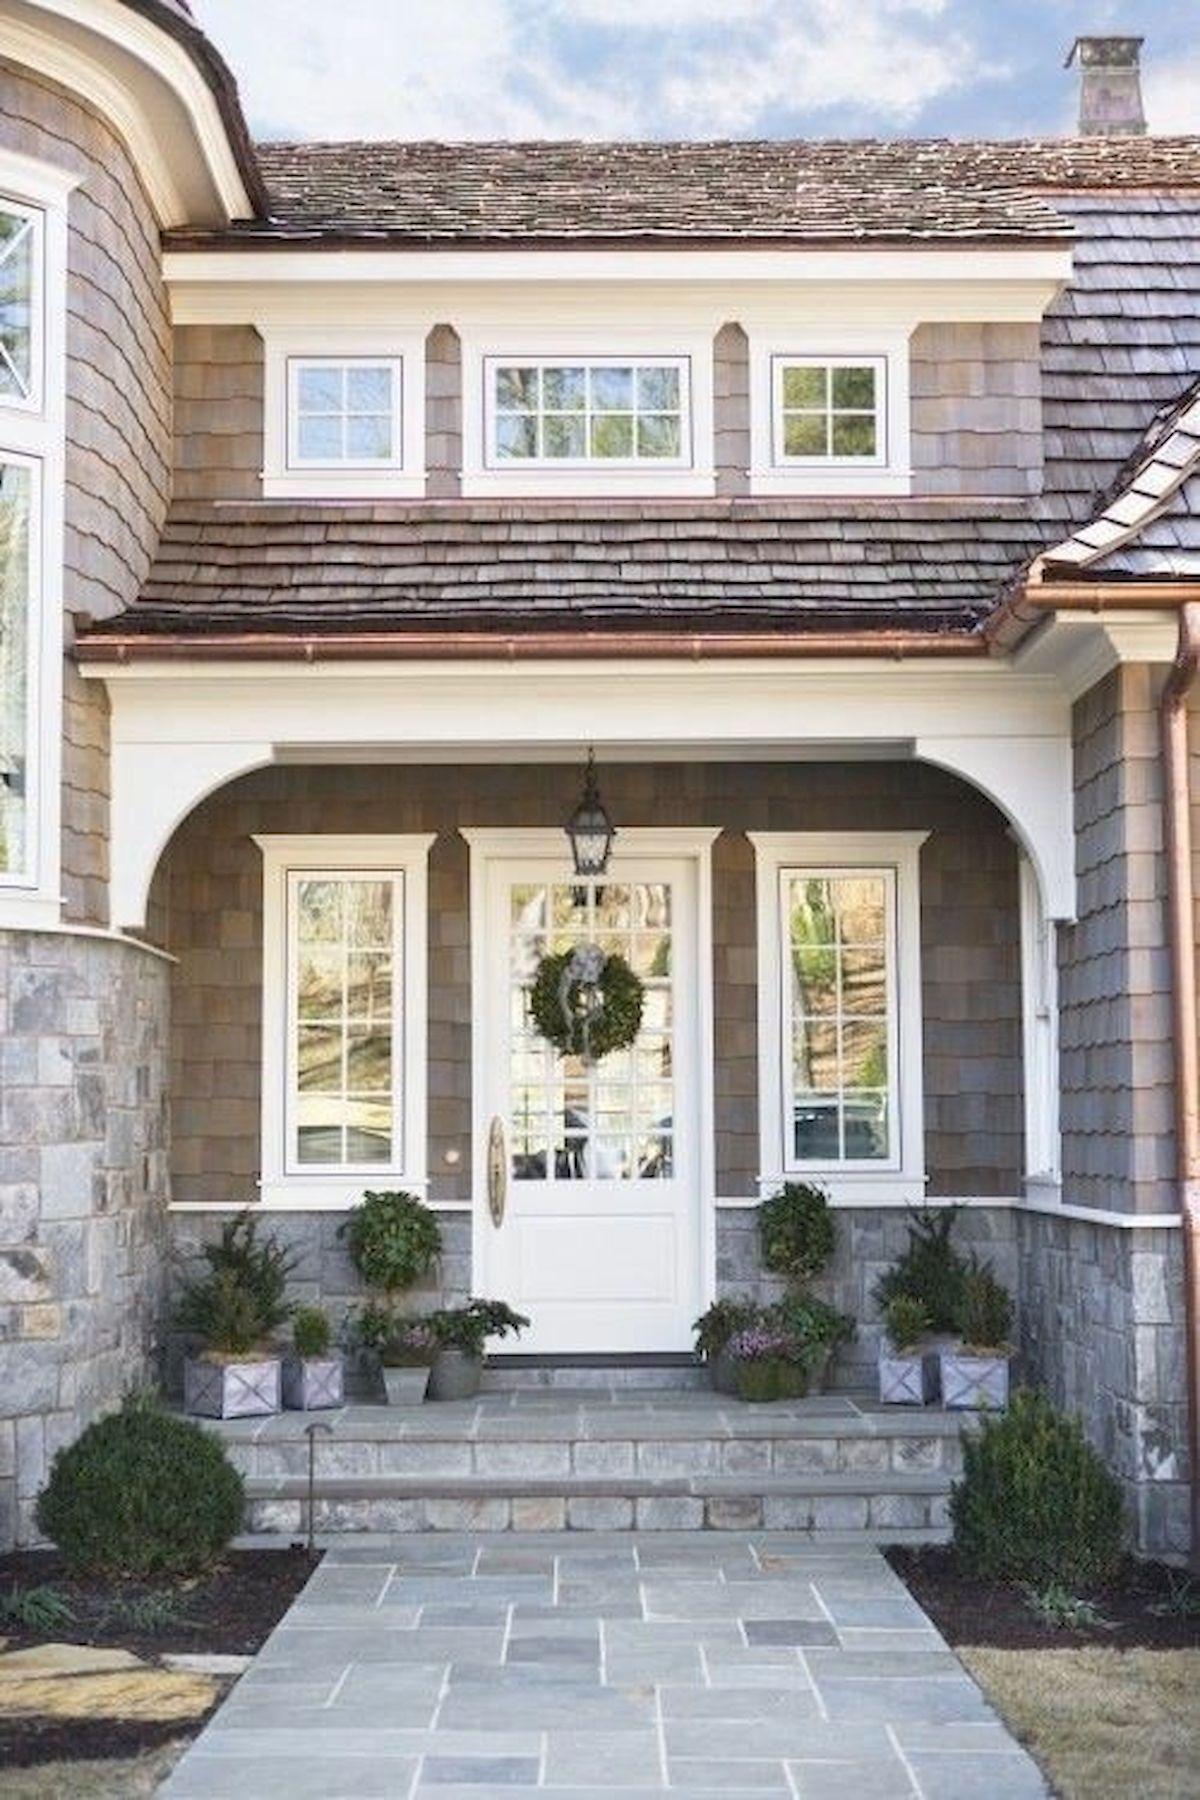 70 Stunning Exterior House Design Ideas (68)